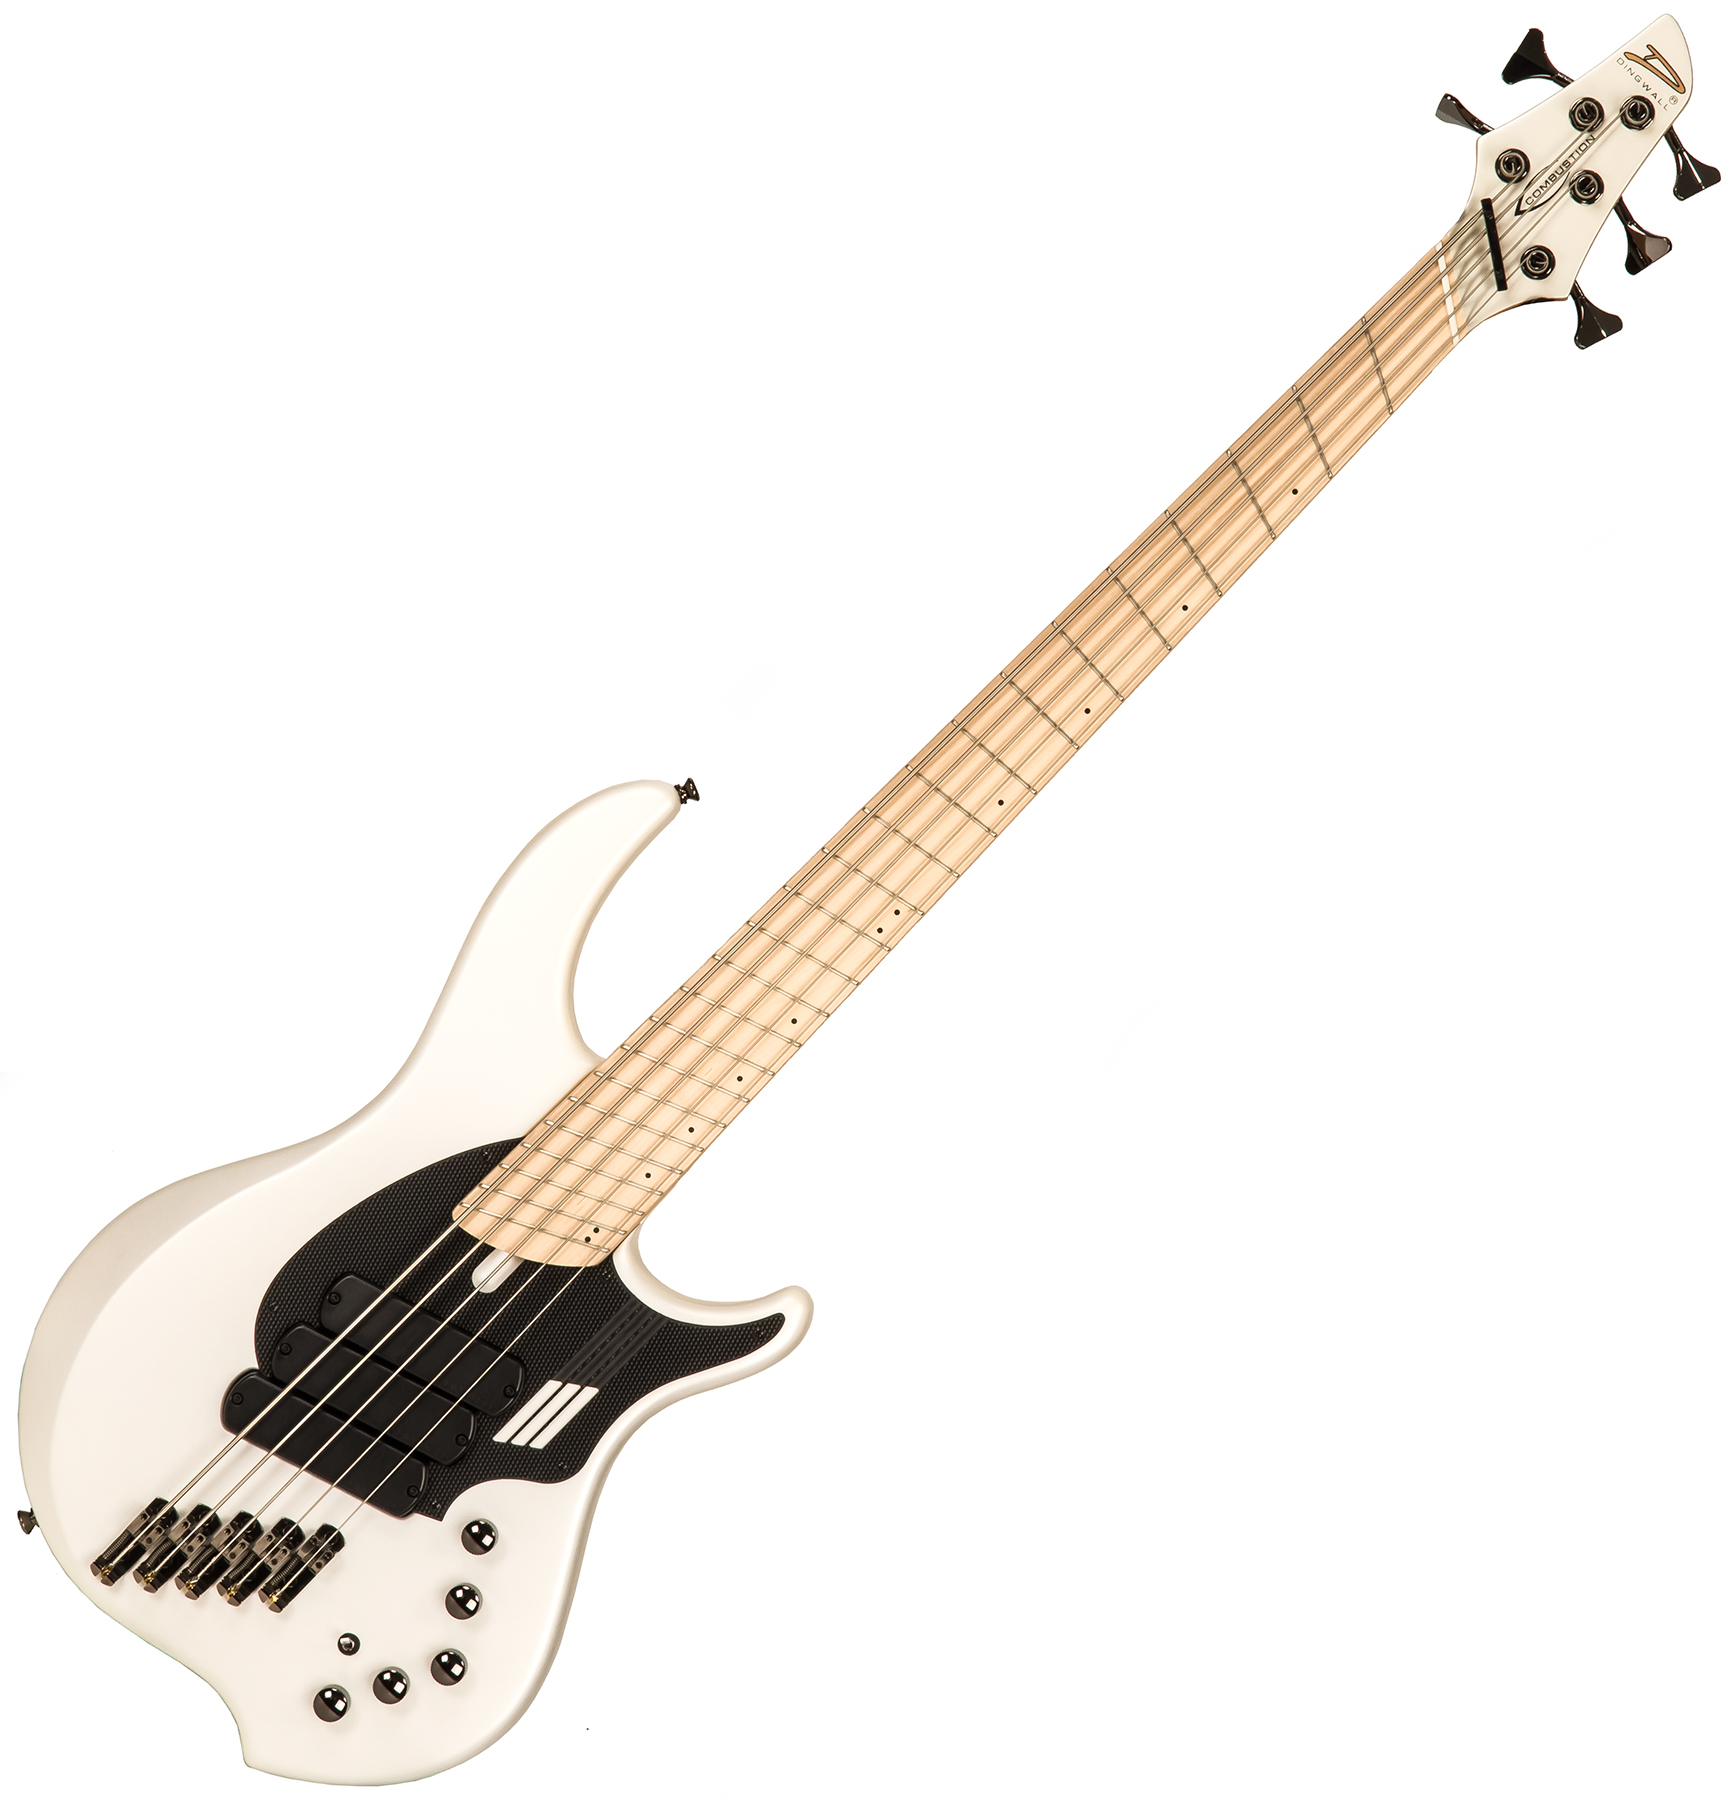 https://www.stars-music.fr/medias/dingwall/adam-nolly-getgood-ng3-5-3-pickups-signature-mn-hd-164027.jpg